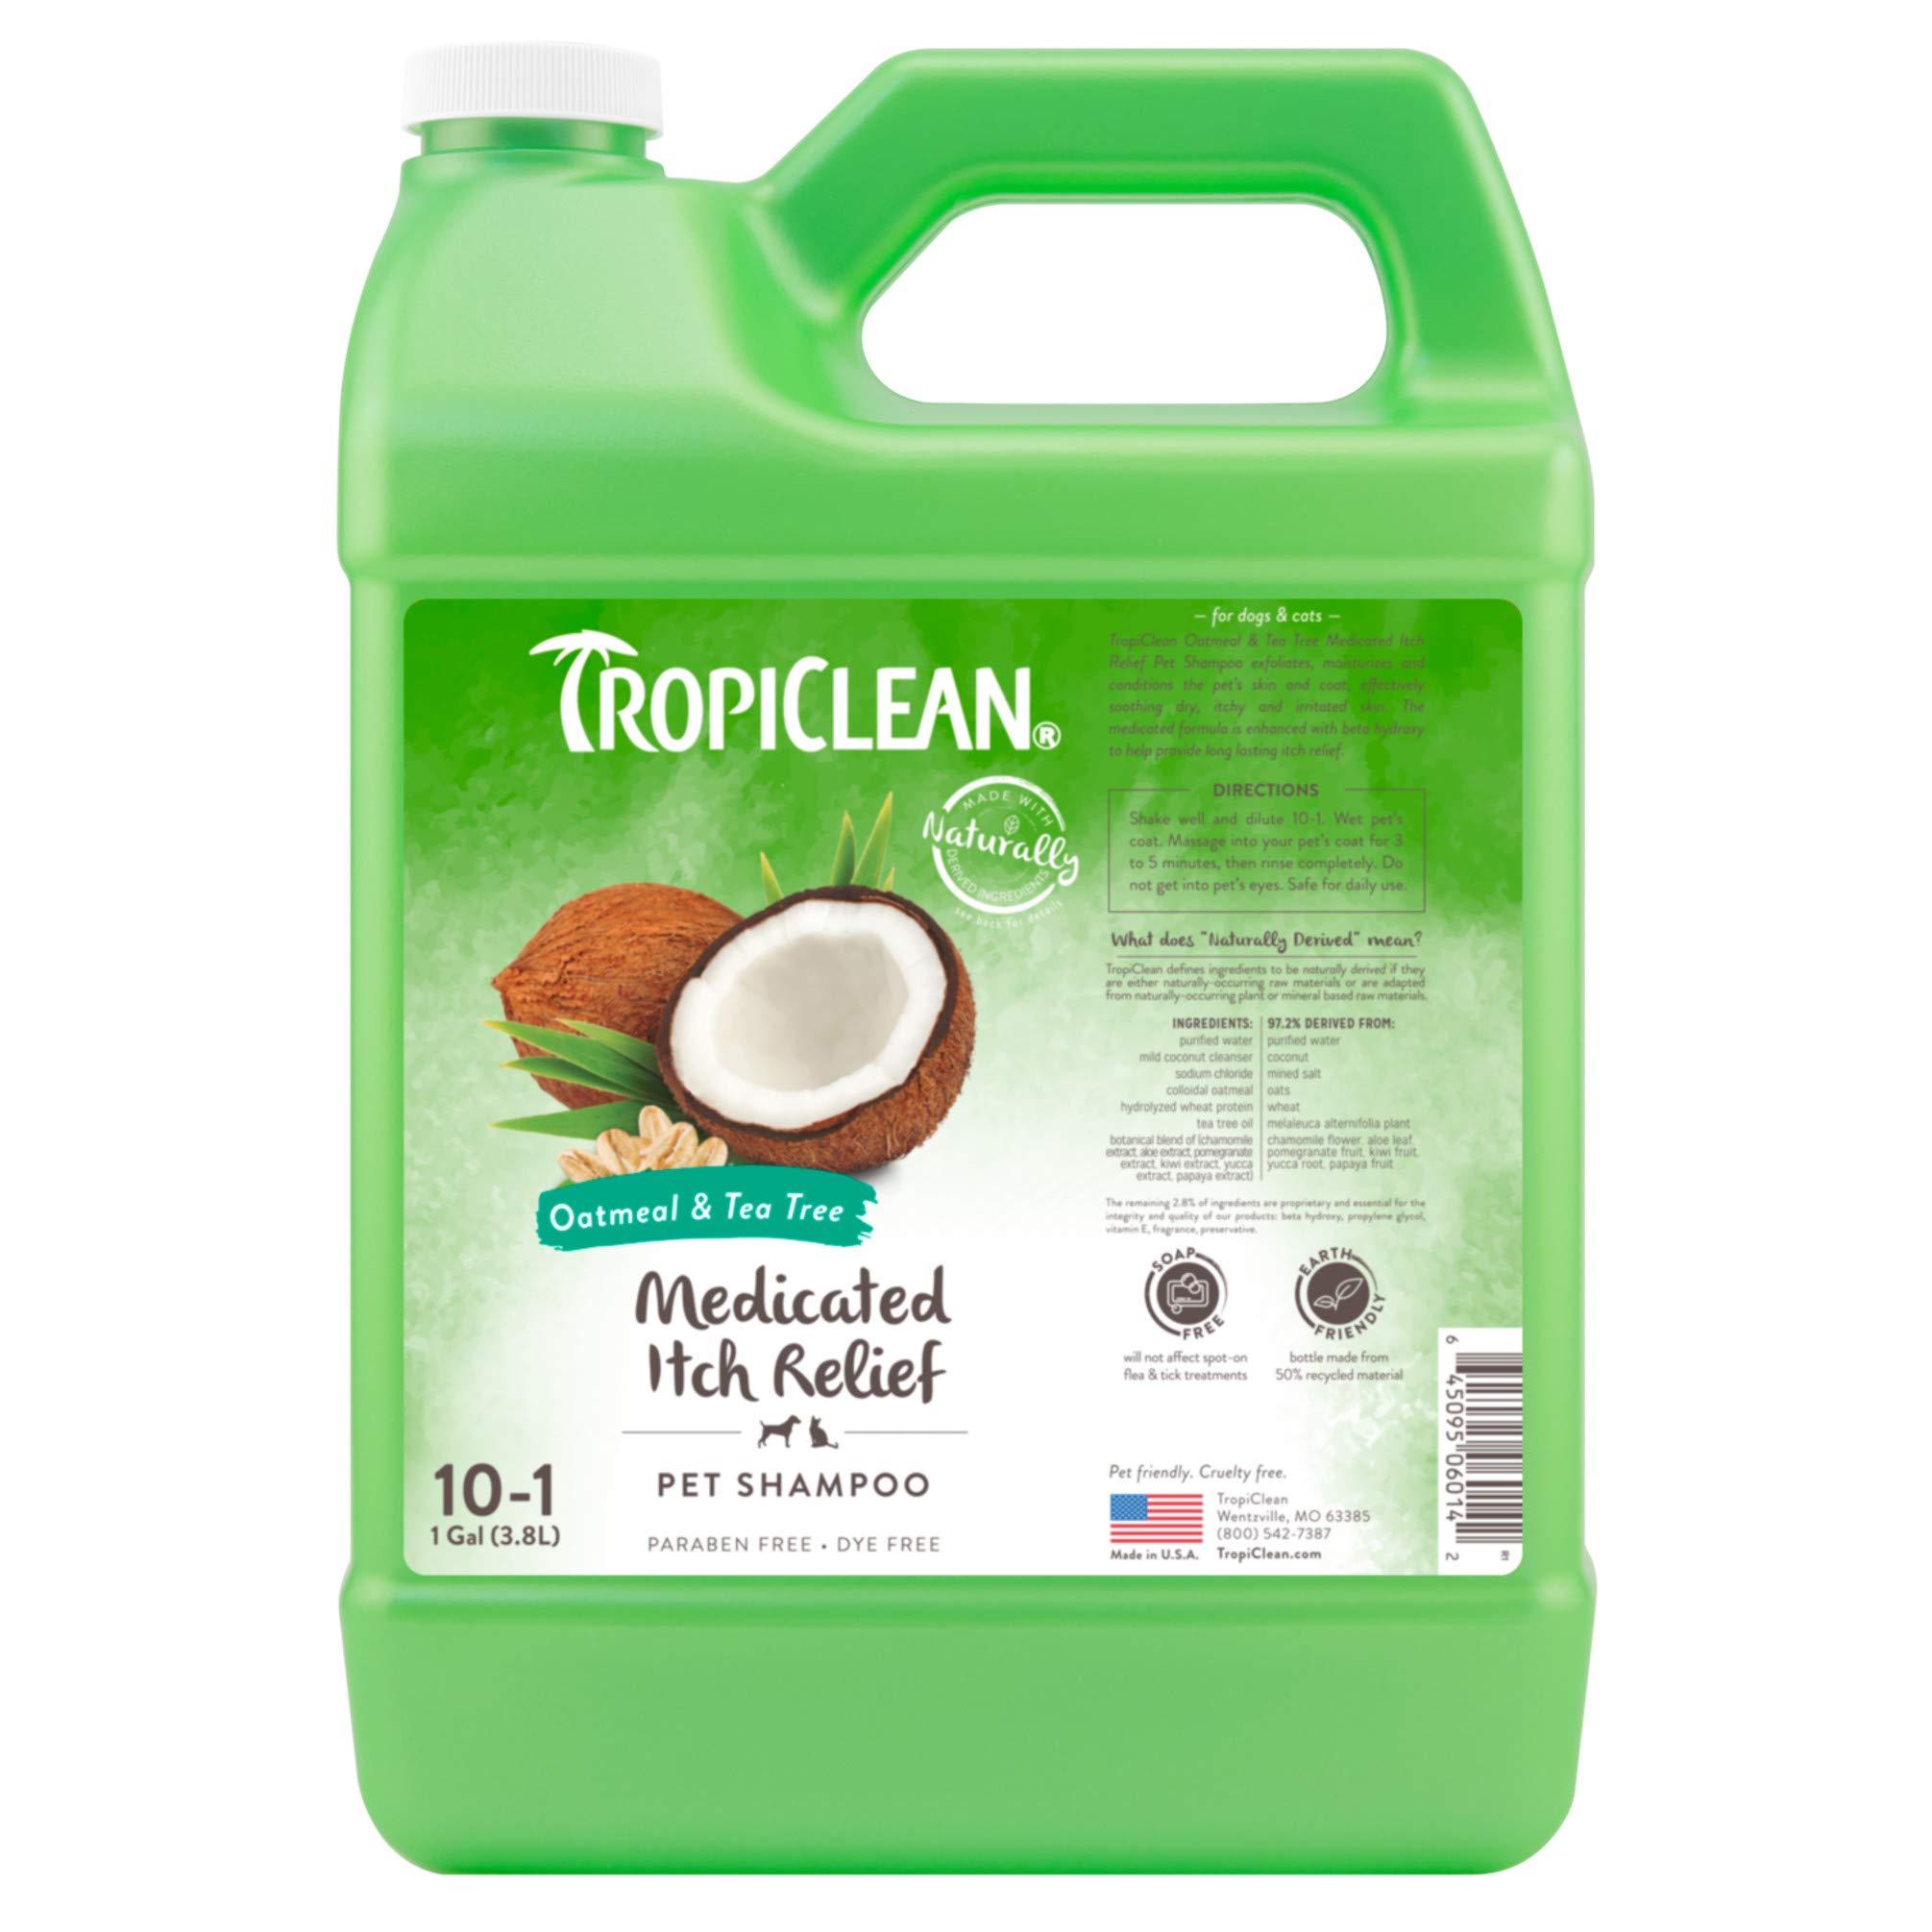 TropiClean Oatmeal & Tea Tree Medicated Dog Shampoo, 1 Gallon by TropiClean